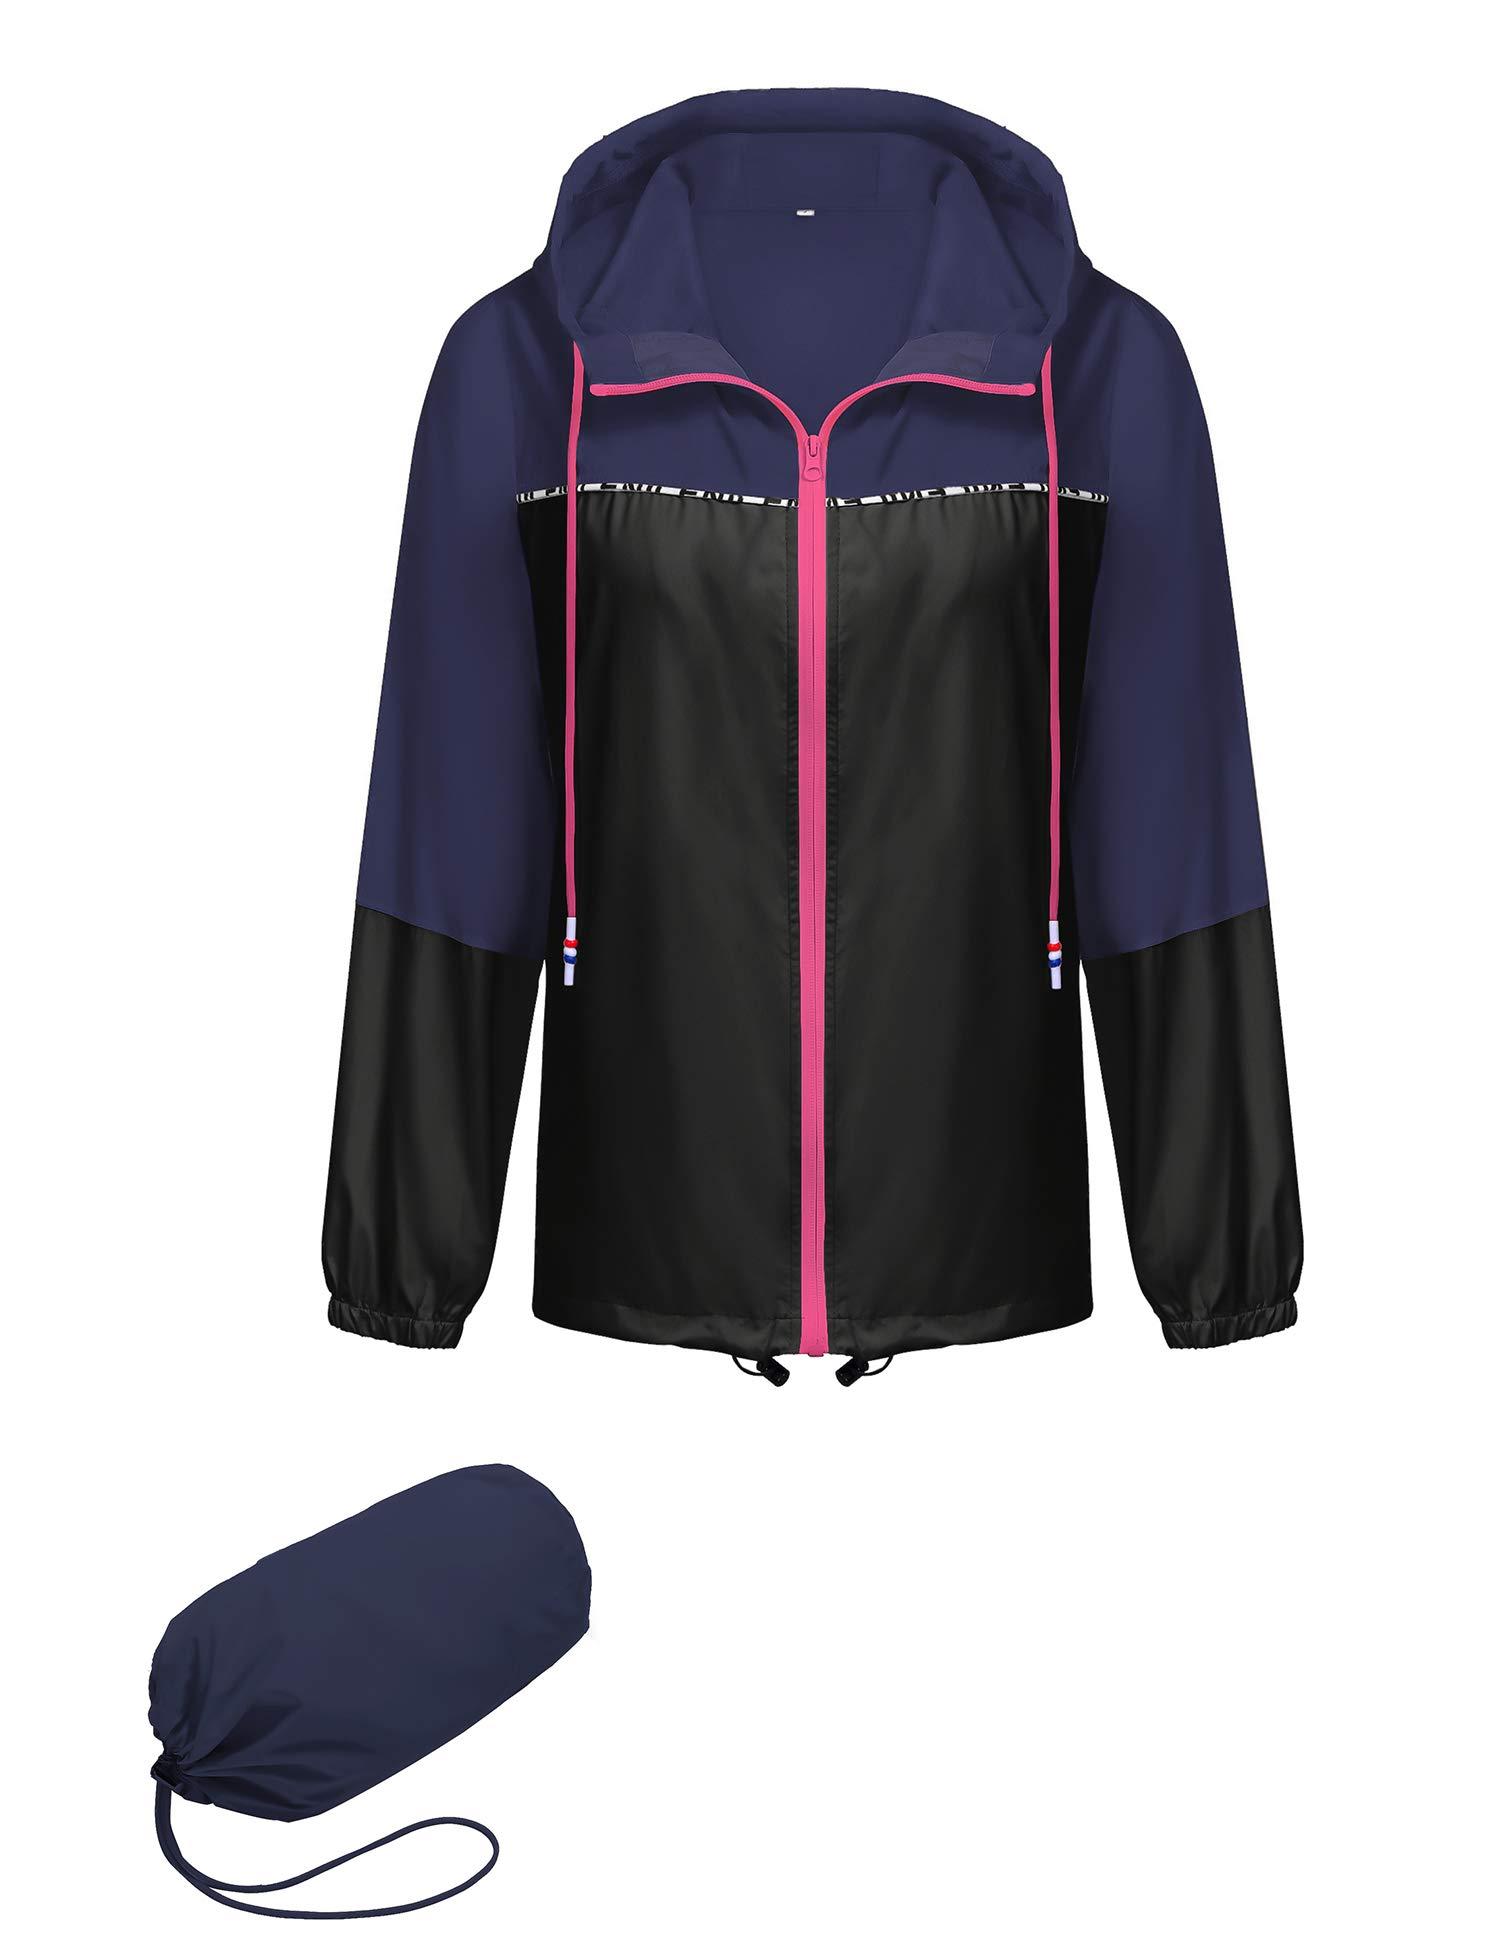 Besshopie Lightweight Raincoat Women Waterproof Windbreaker Packable Outdoor Hooded Rain Jacket